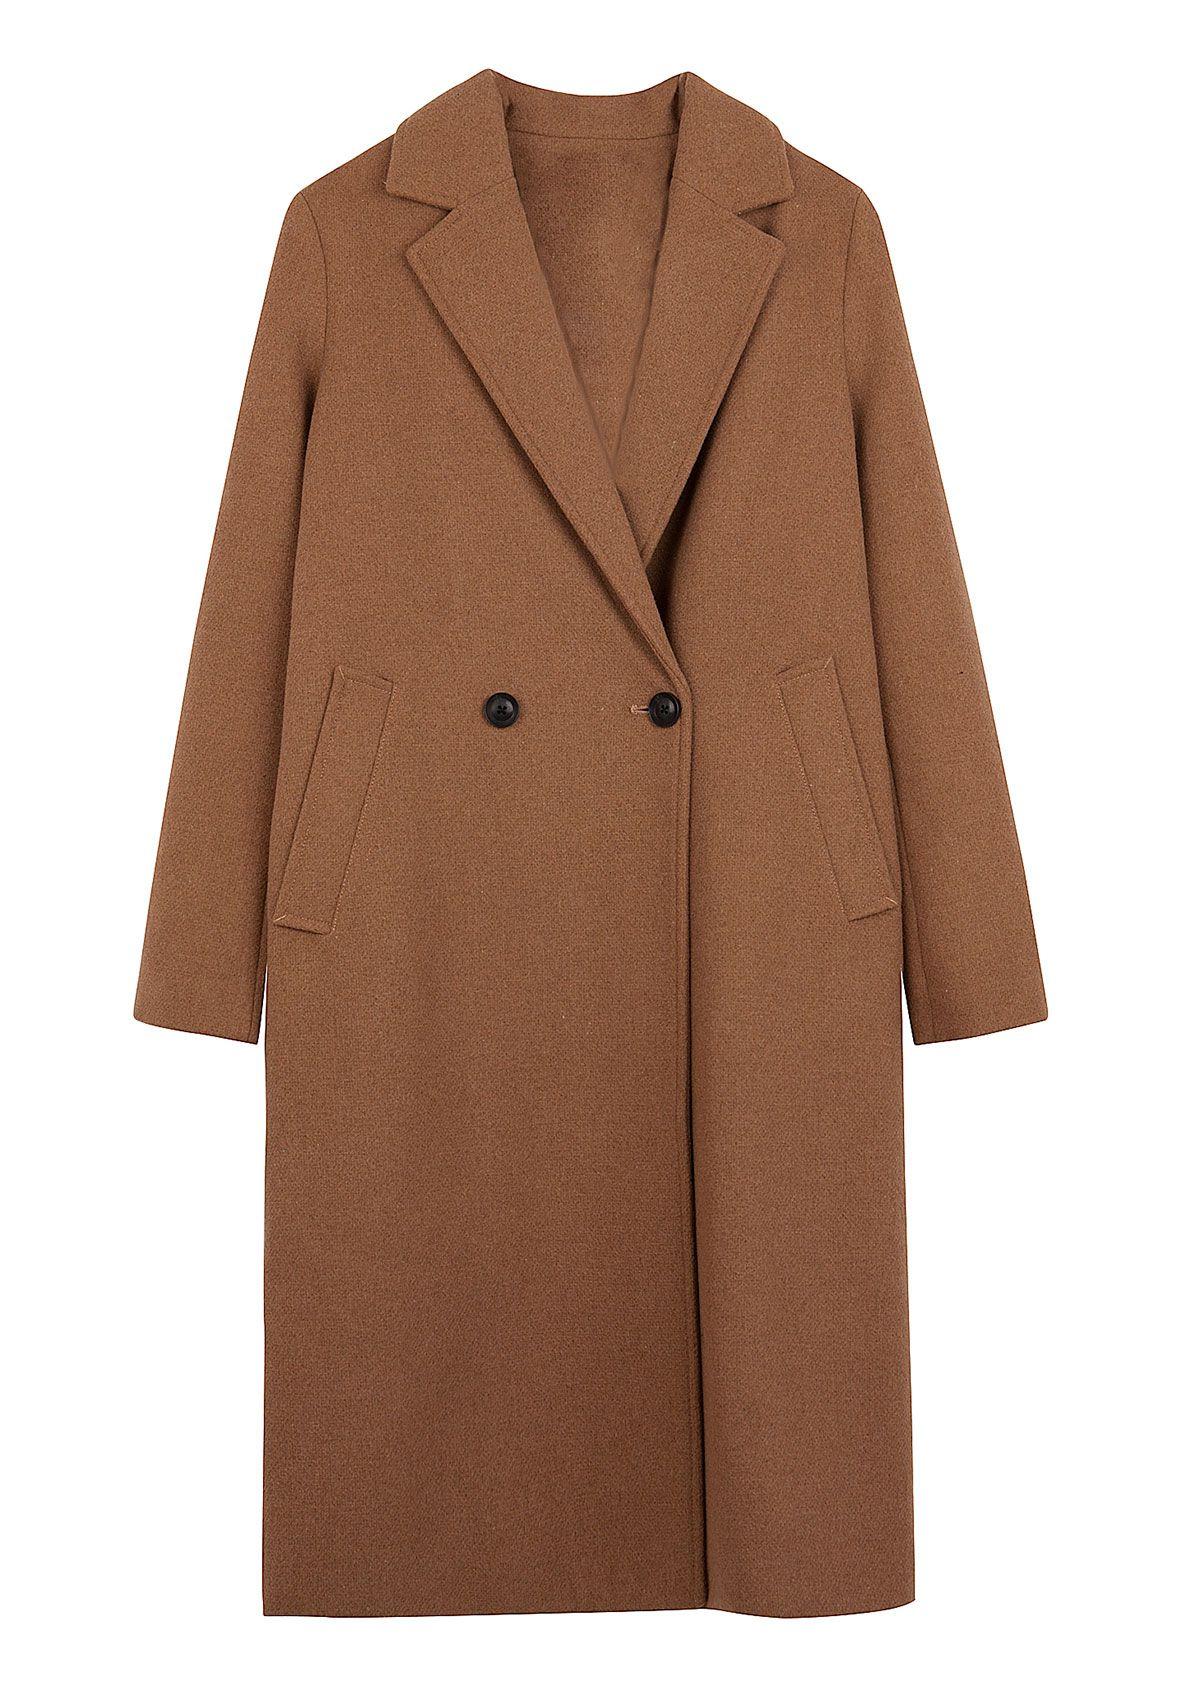 Especial moda: Abrigos monocolor por menos de 100 €.